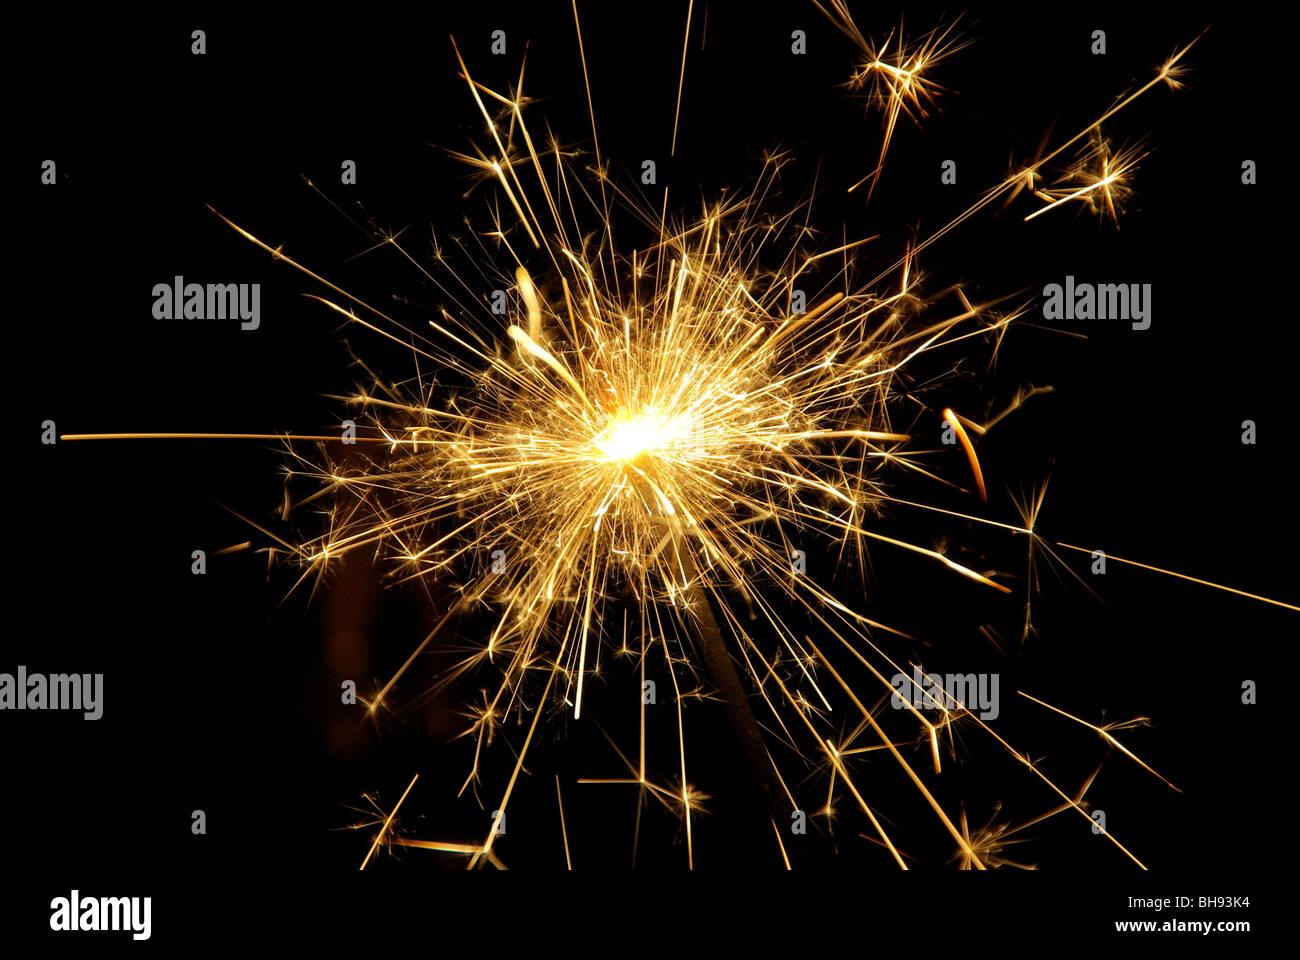 Wunderkerze - sparkler 05 Immagini Stock